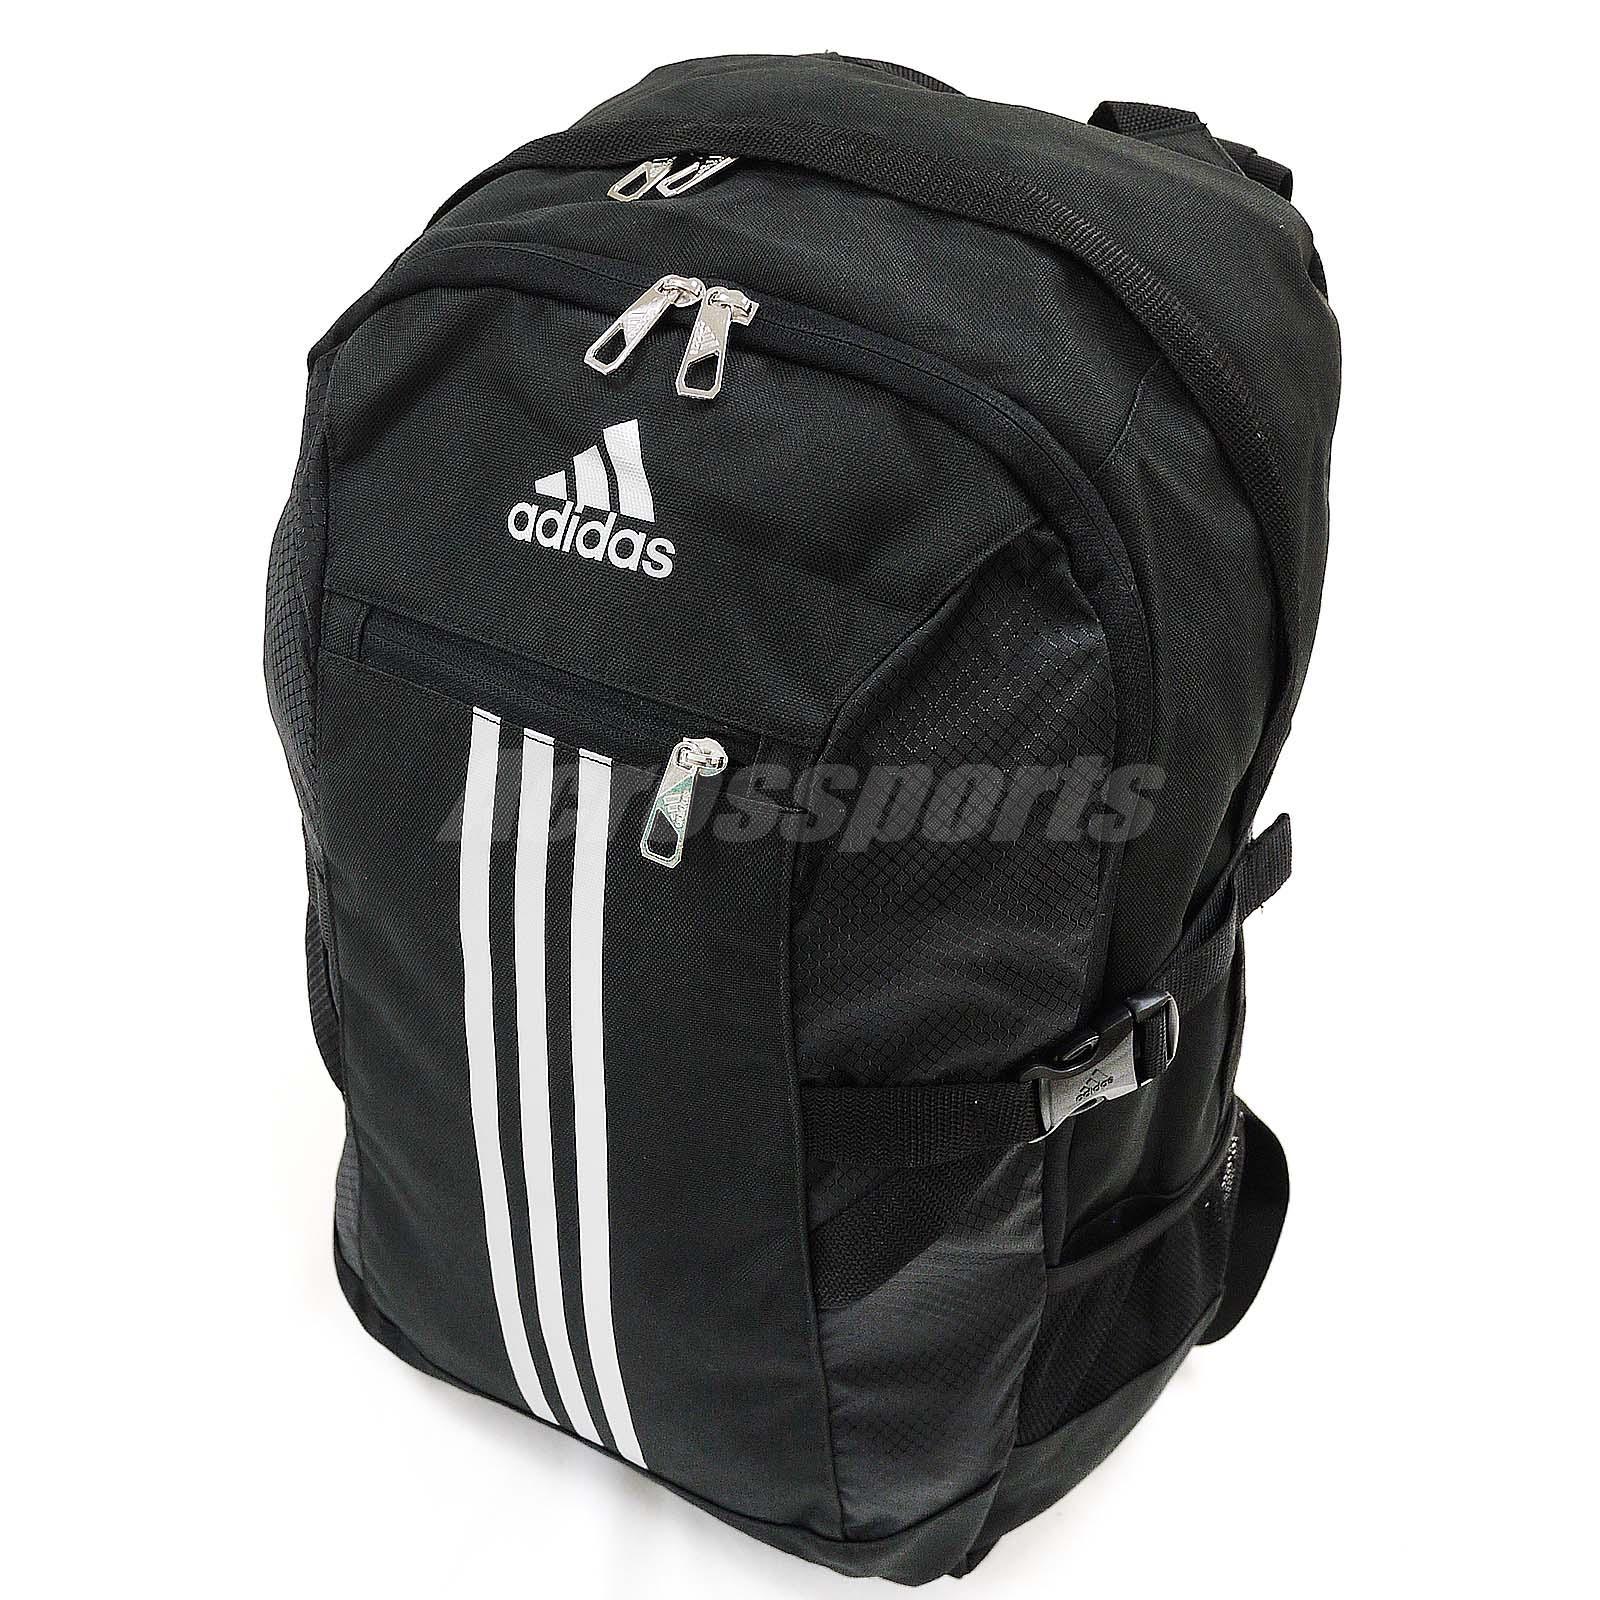 Adidas 3 Stripes Backpack Black White- Fenix Toulouse Handball 6be83b4fc7fd7